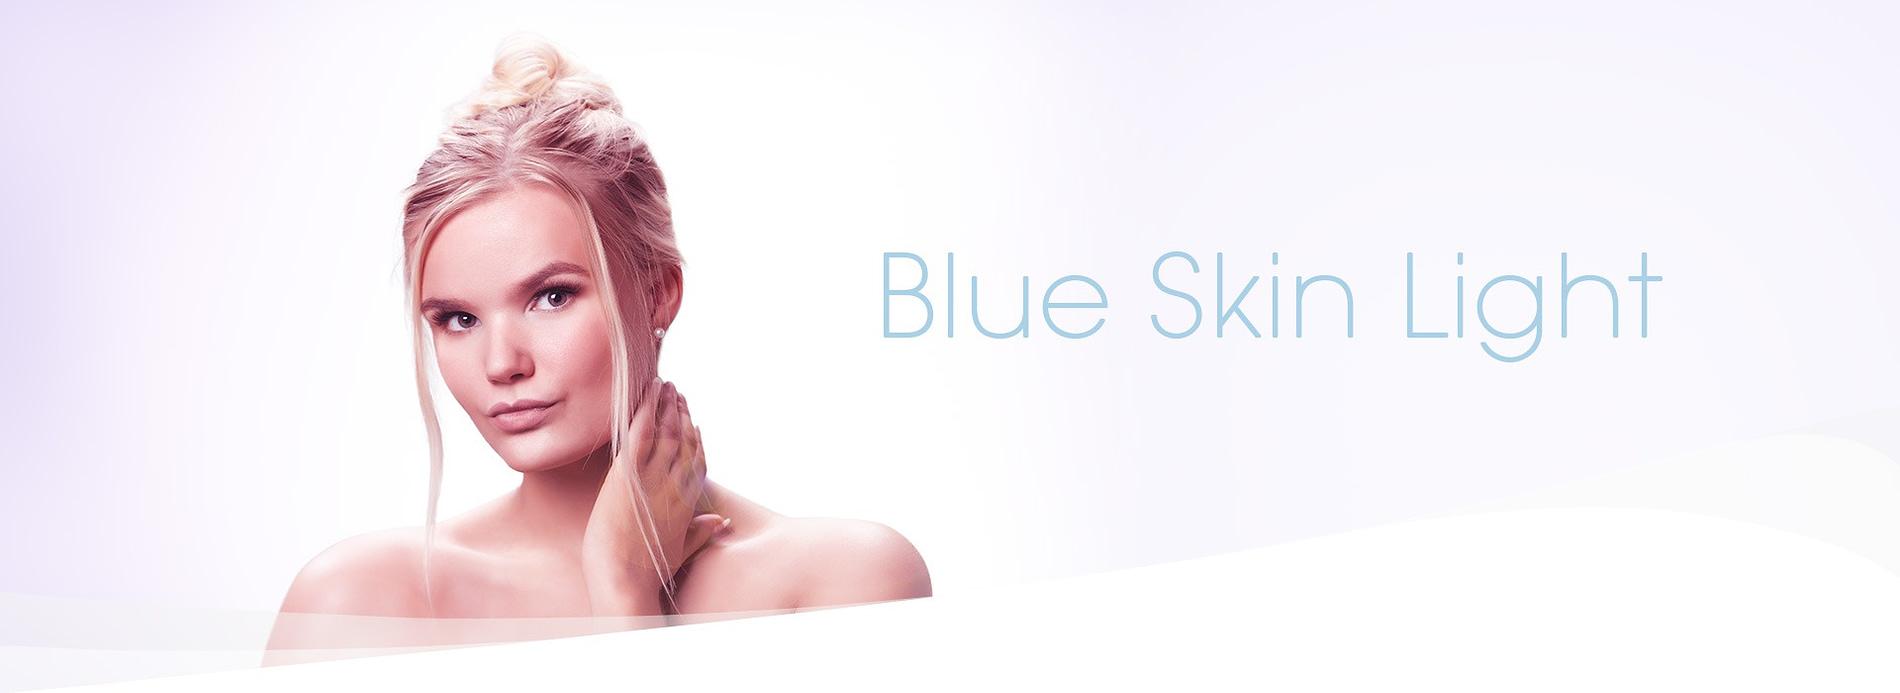 Dr. Muller header Blue Skin Light research